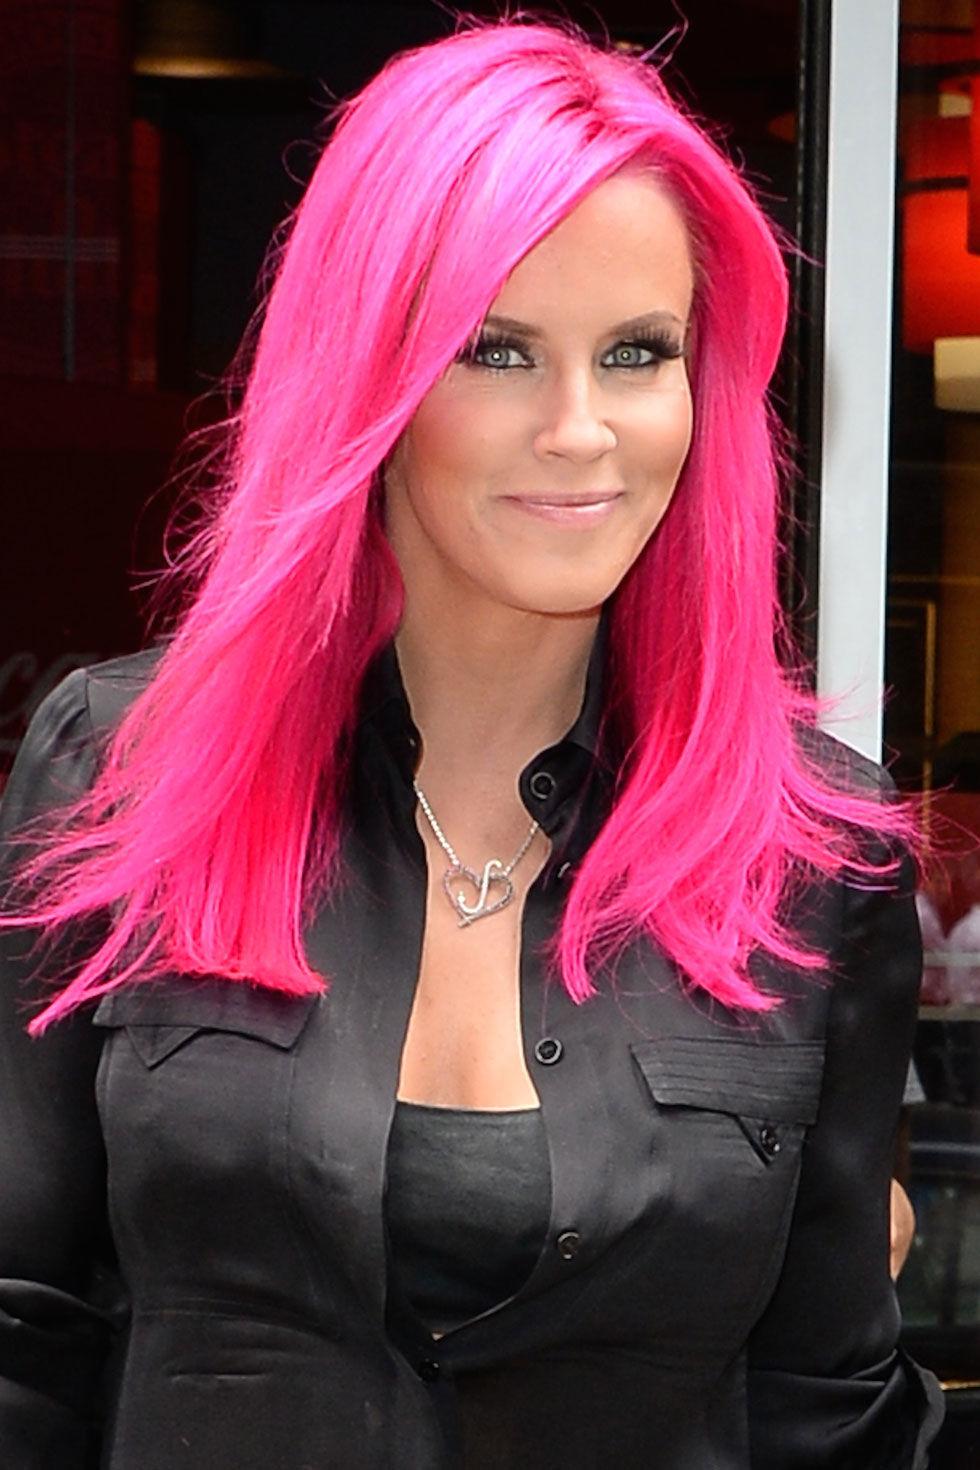 Dye Black Hair Pink Impression Hair Style